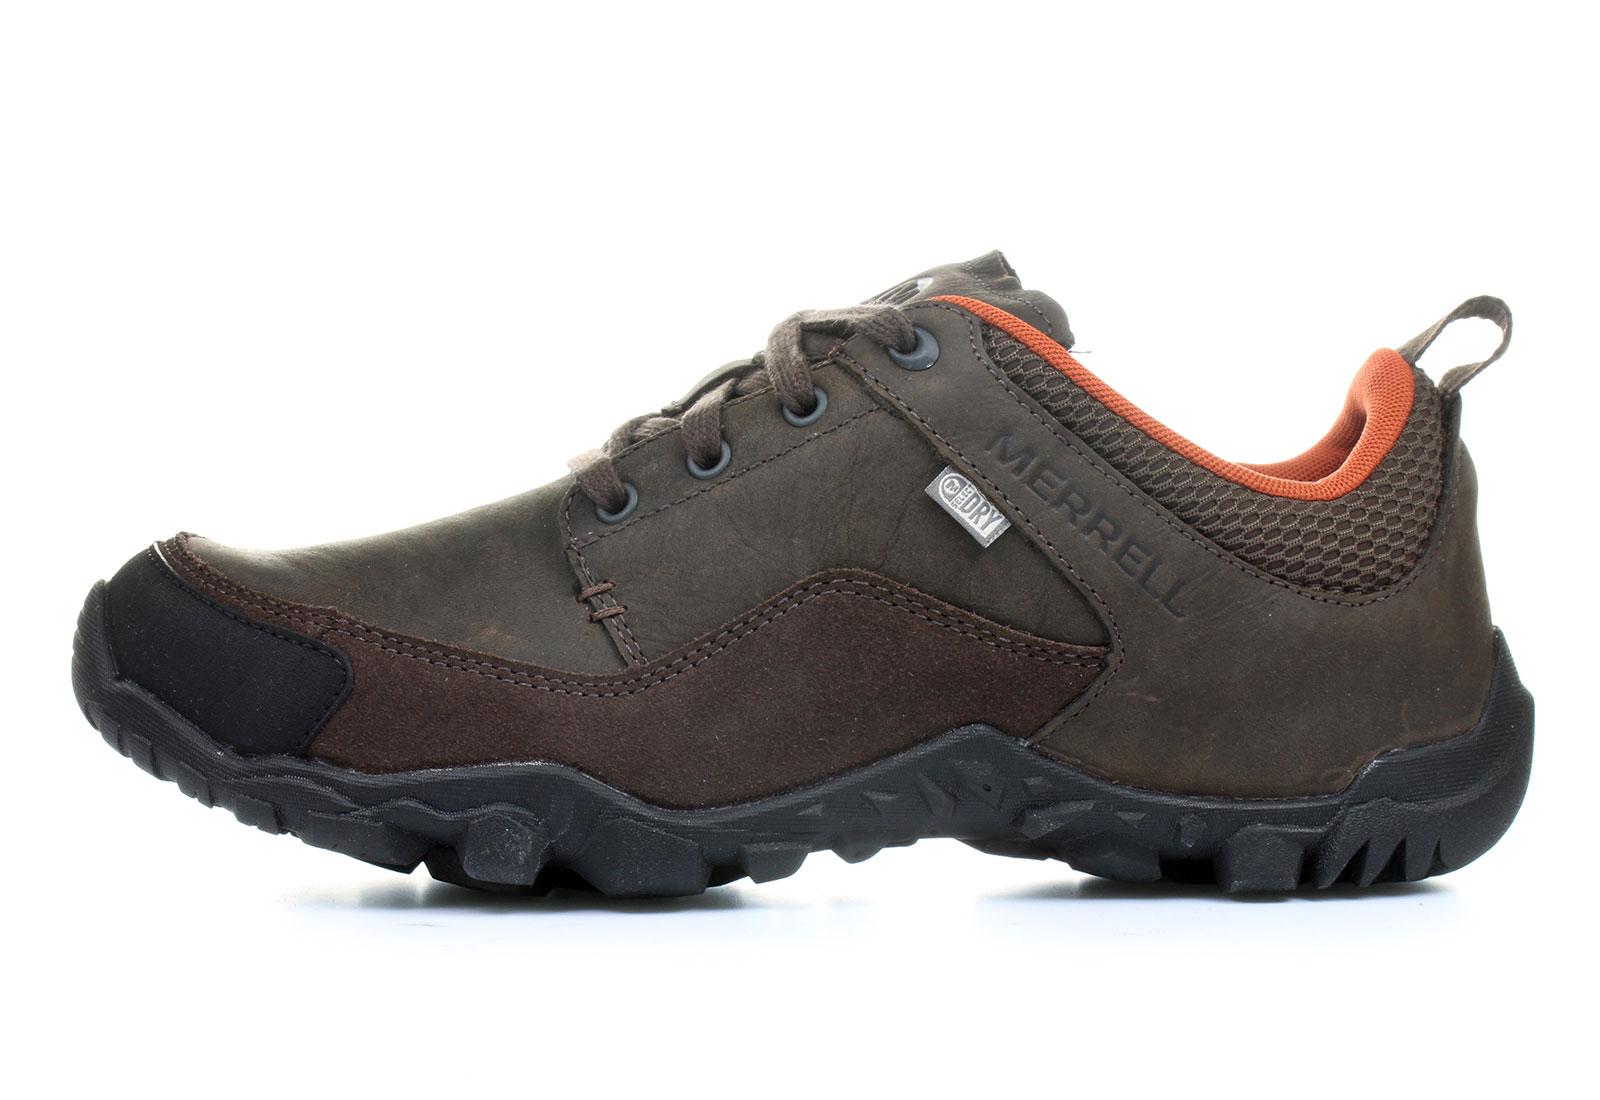 120ed871ff Merrell Cipő - Telluride Wtpf - J23535-brn - Office Shoes Magyarország